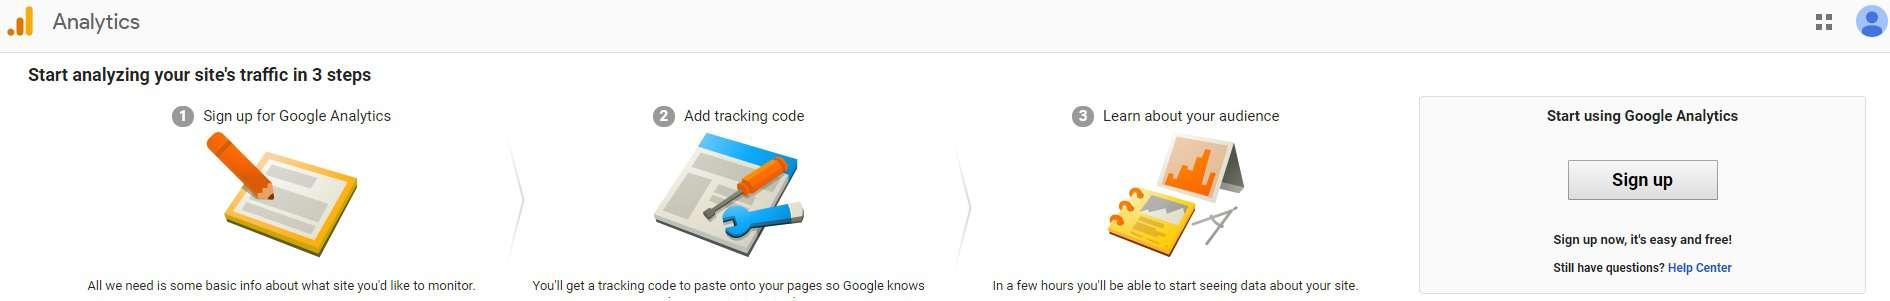 Google Analytics Initial Page